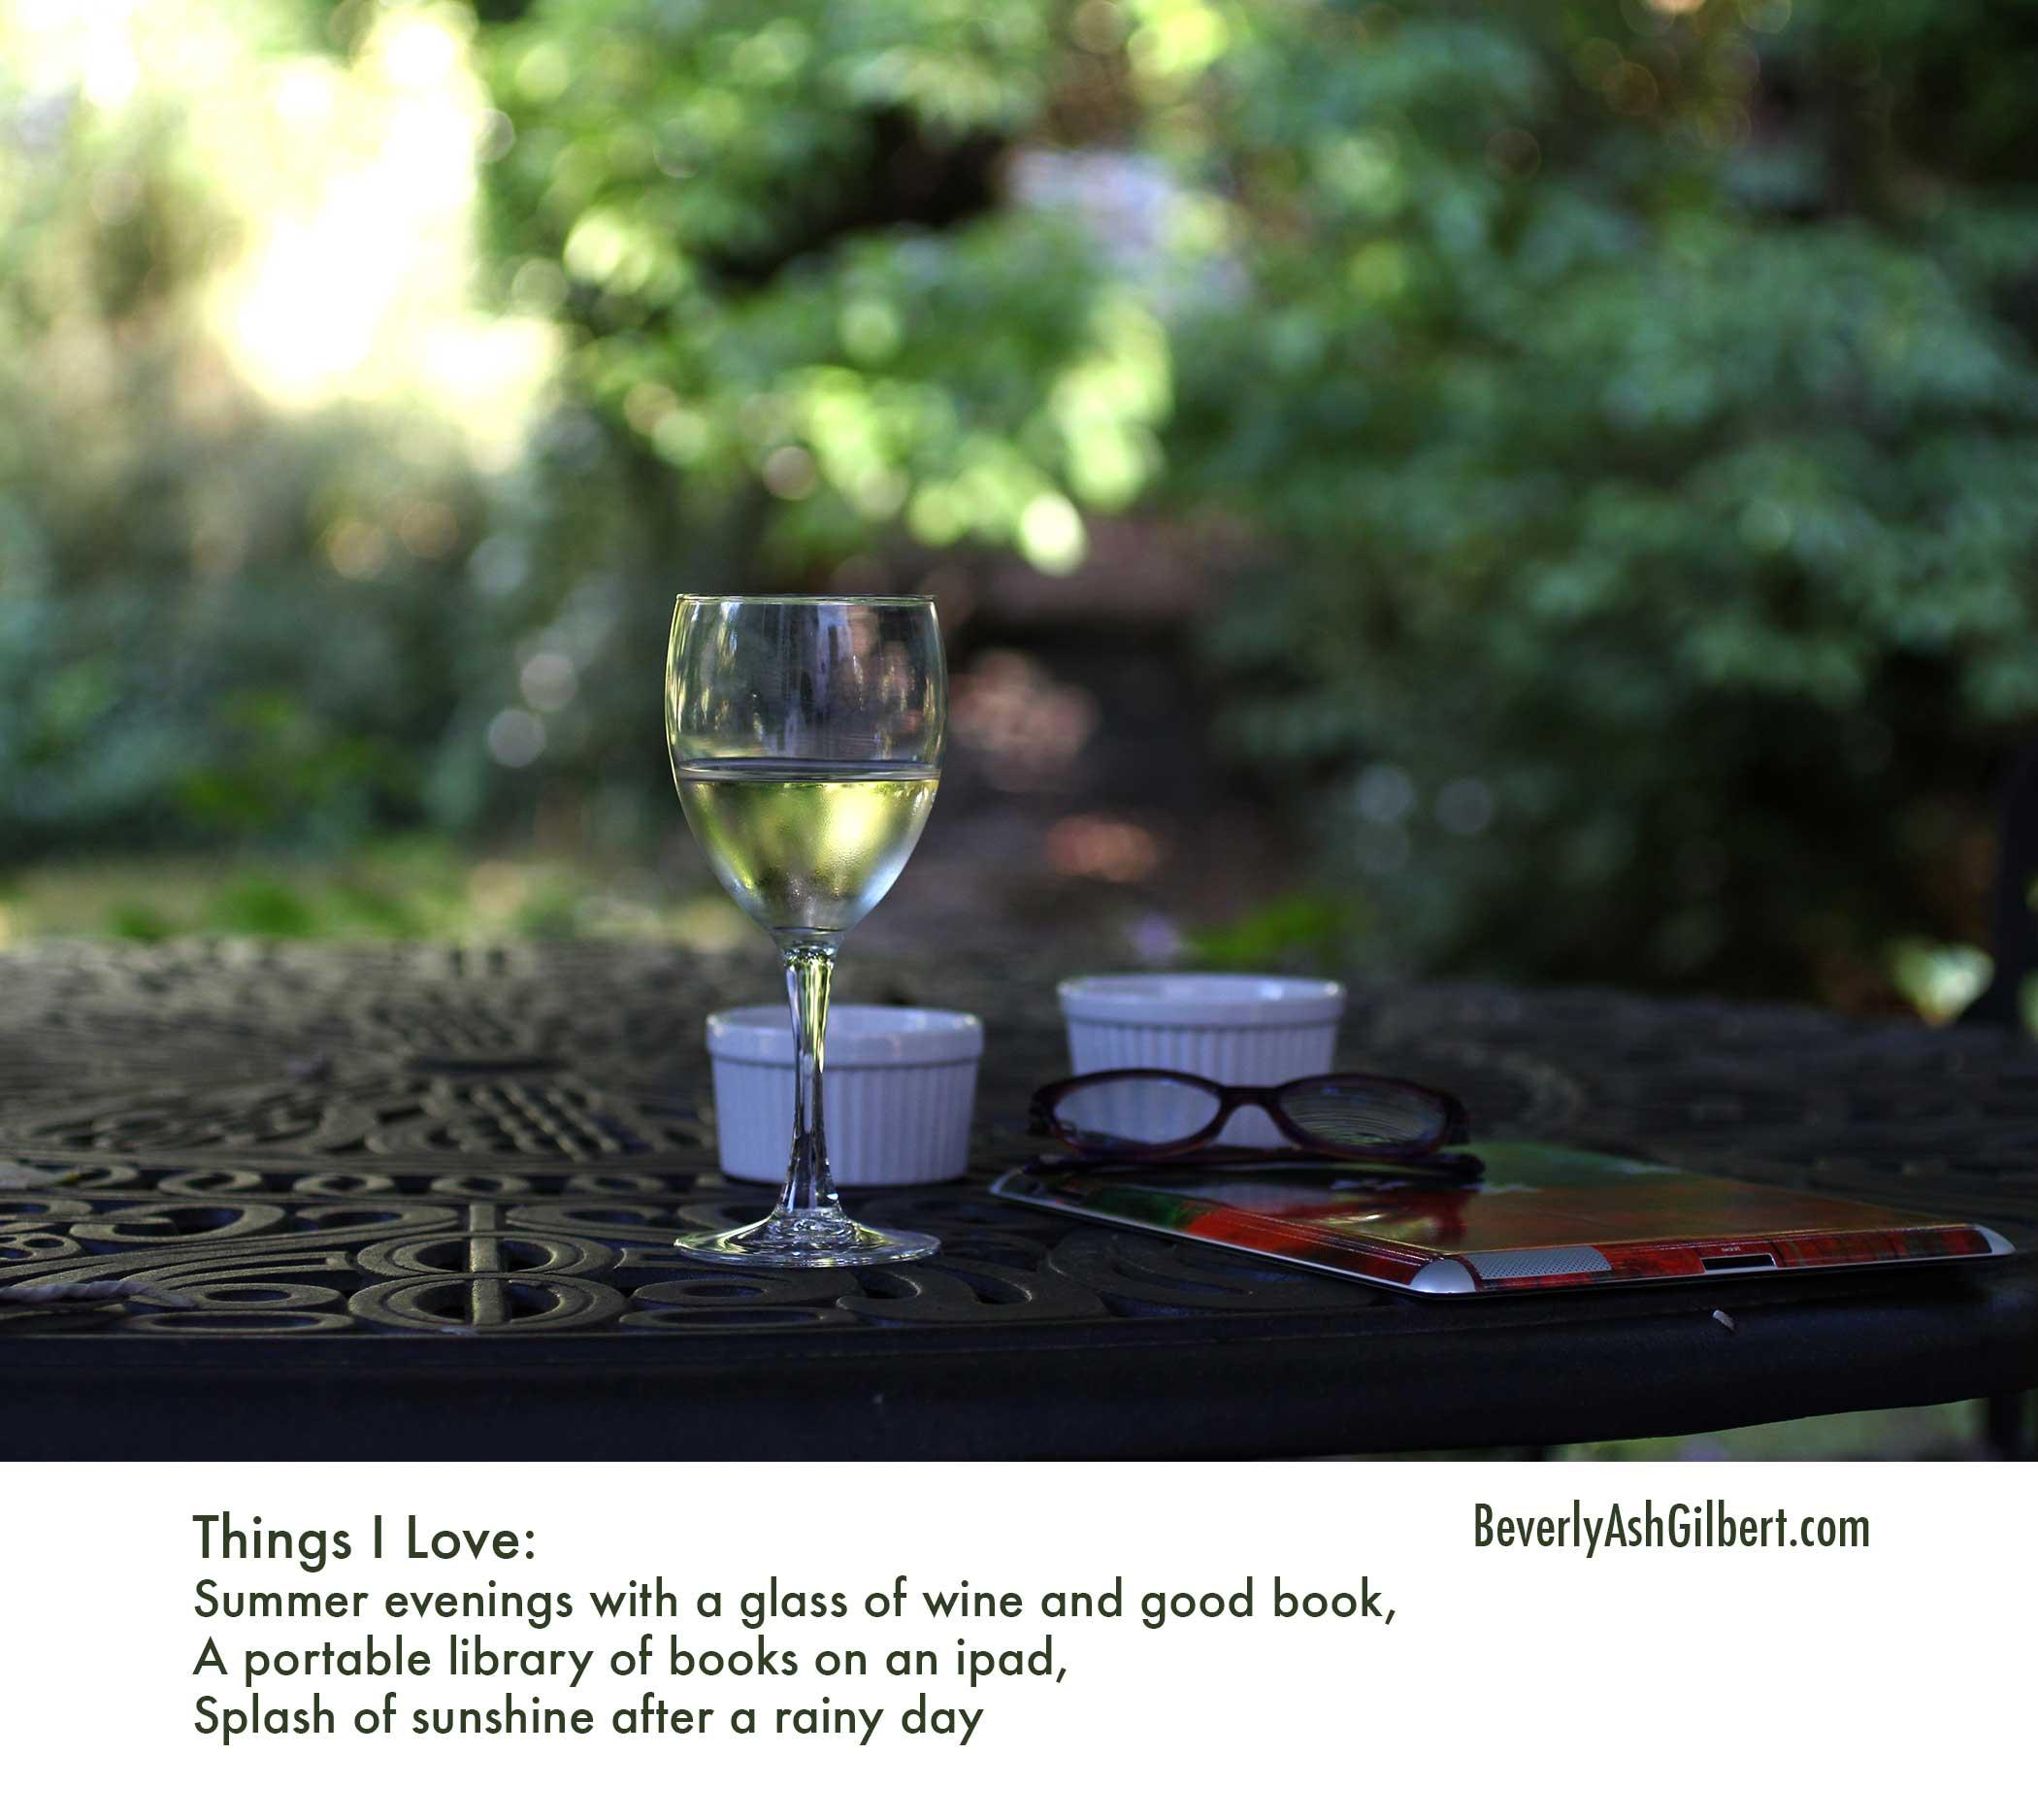 ThingsILove_WineBook.jpg